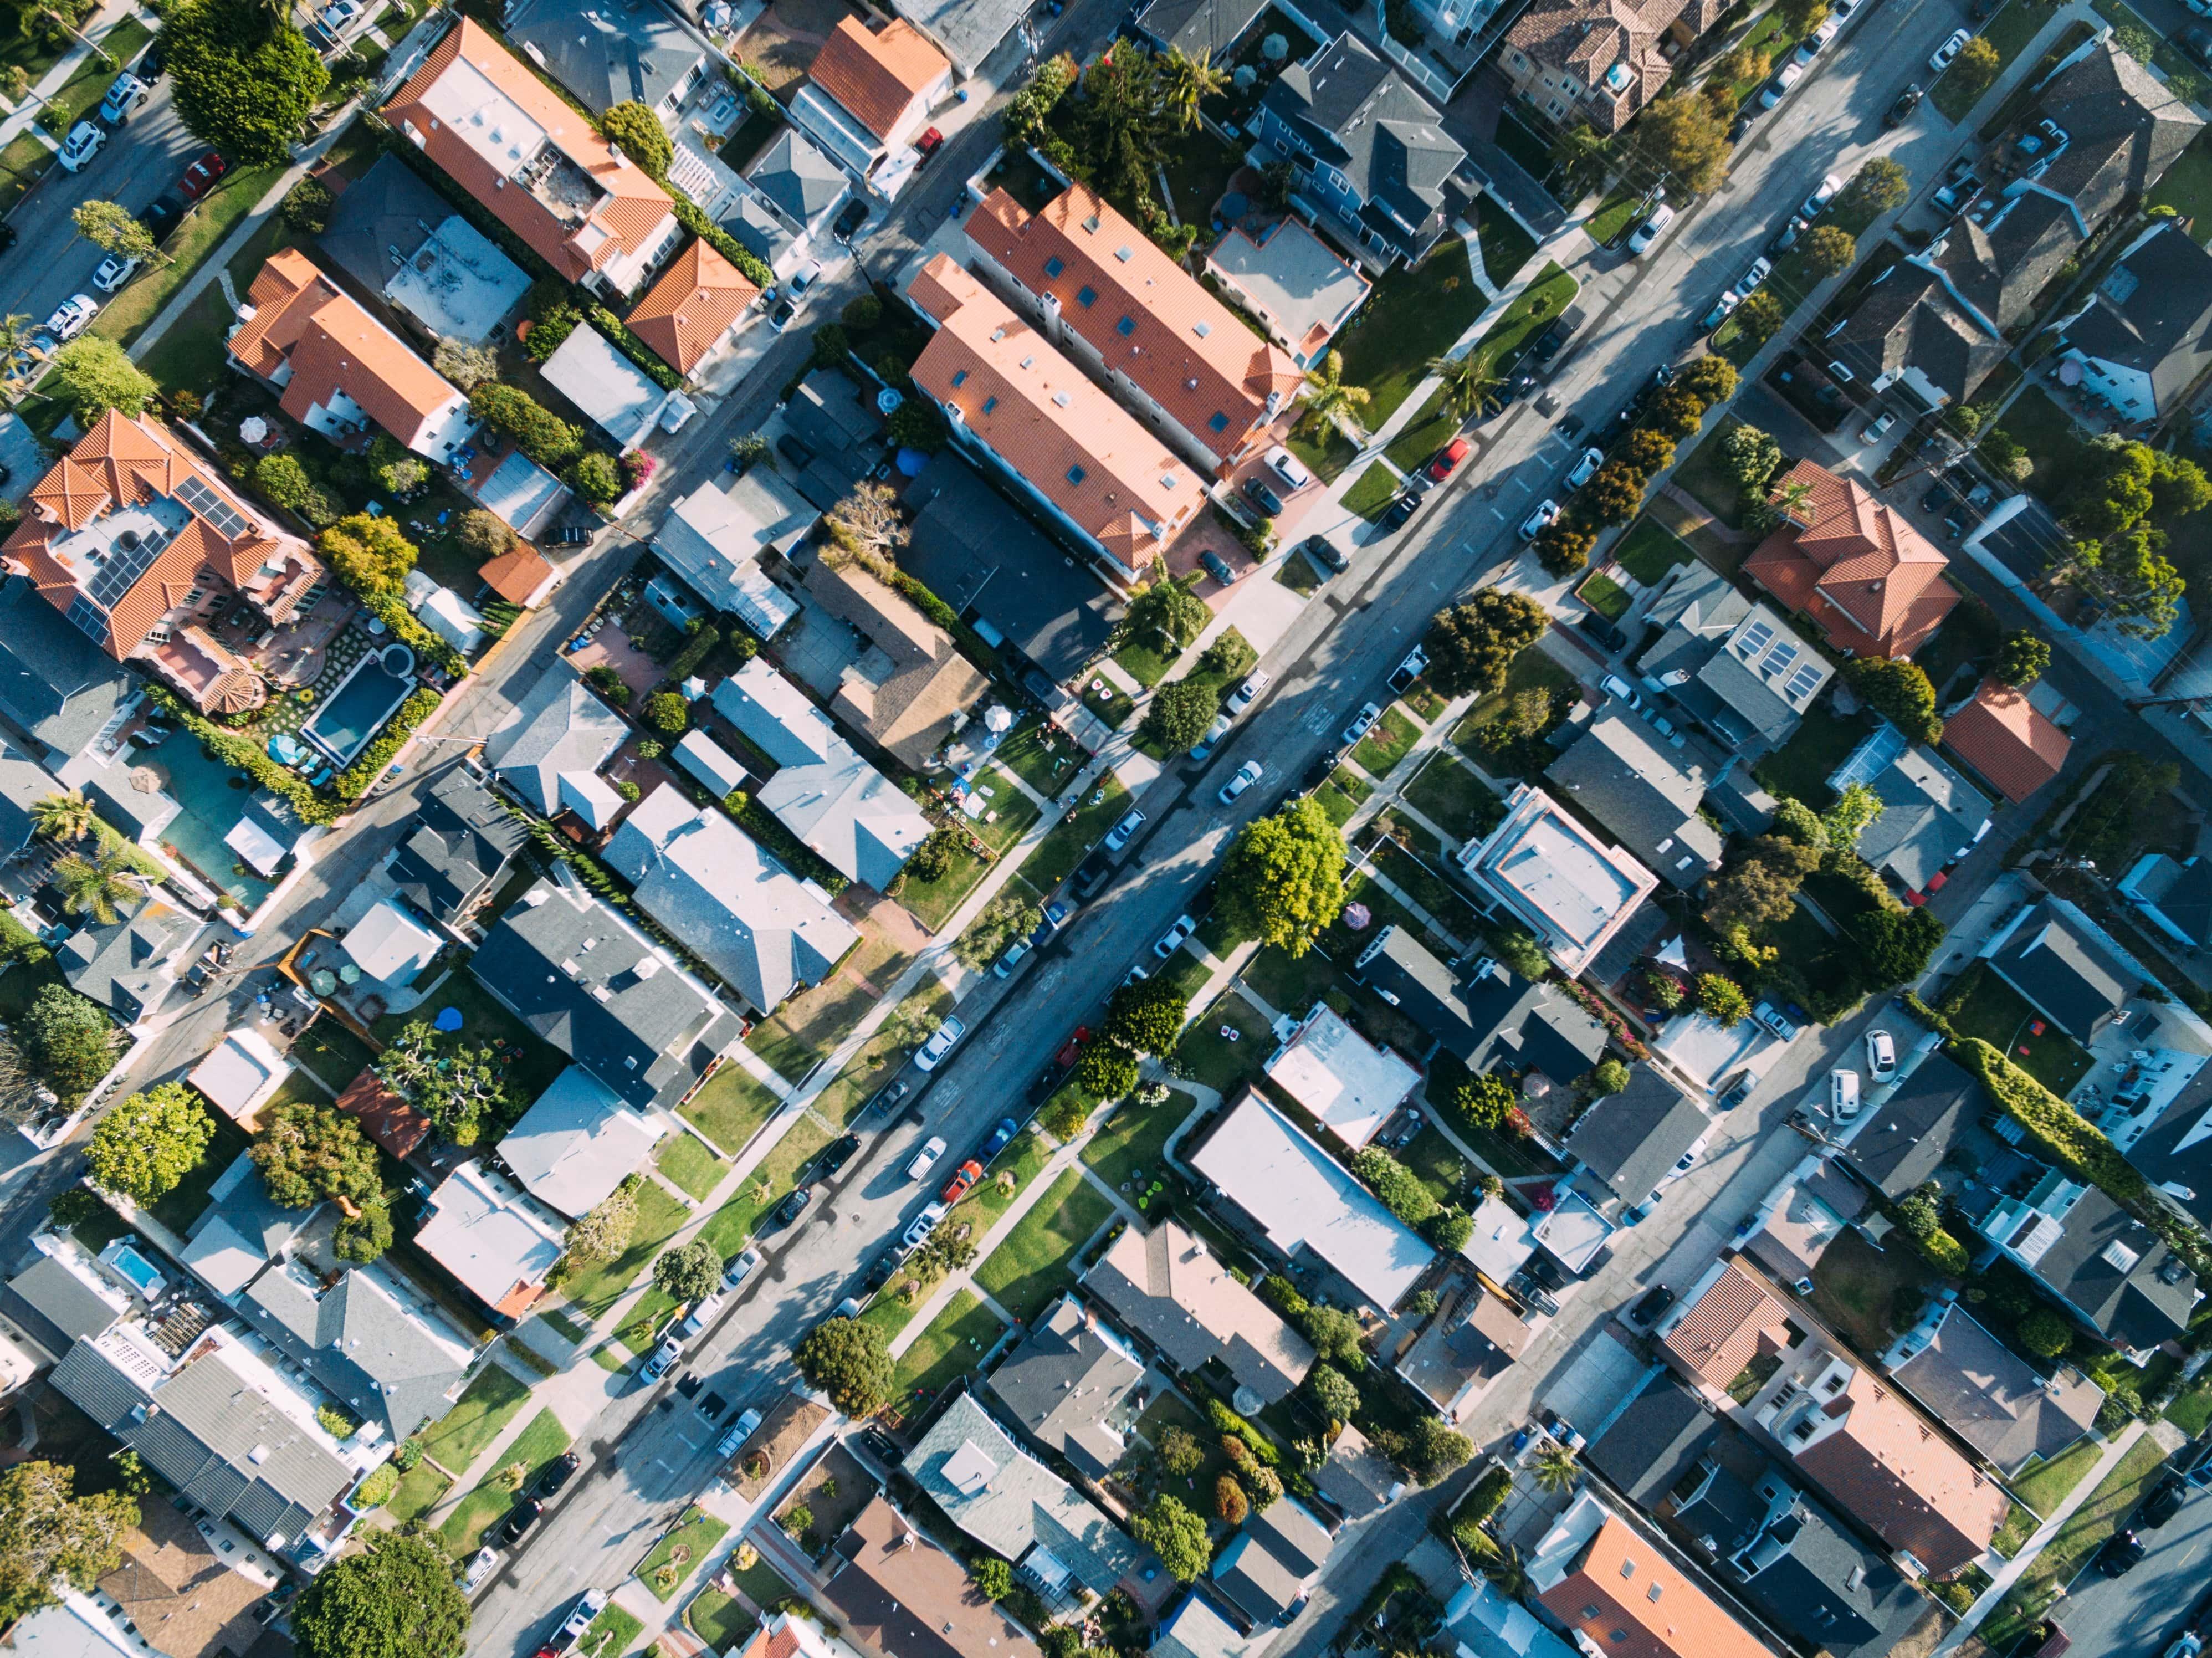 Crowdfunding logements sociaux